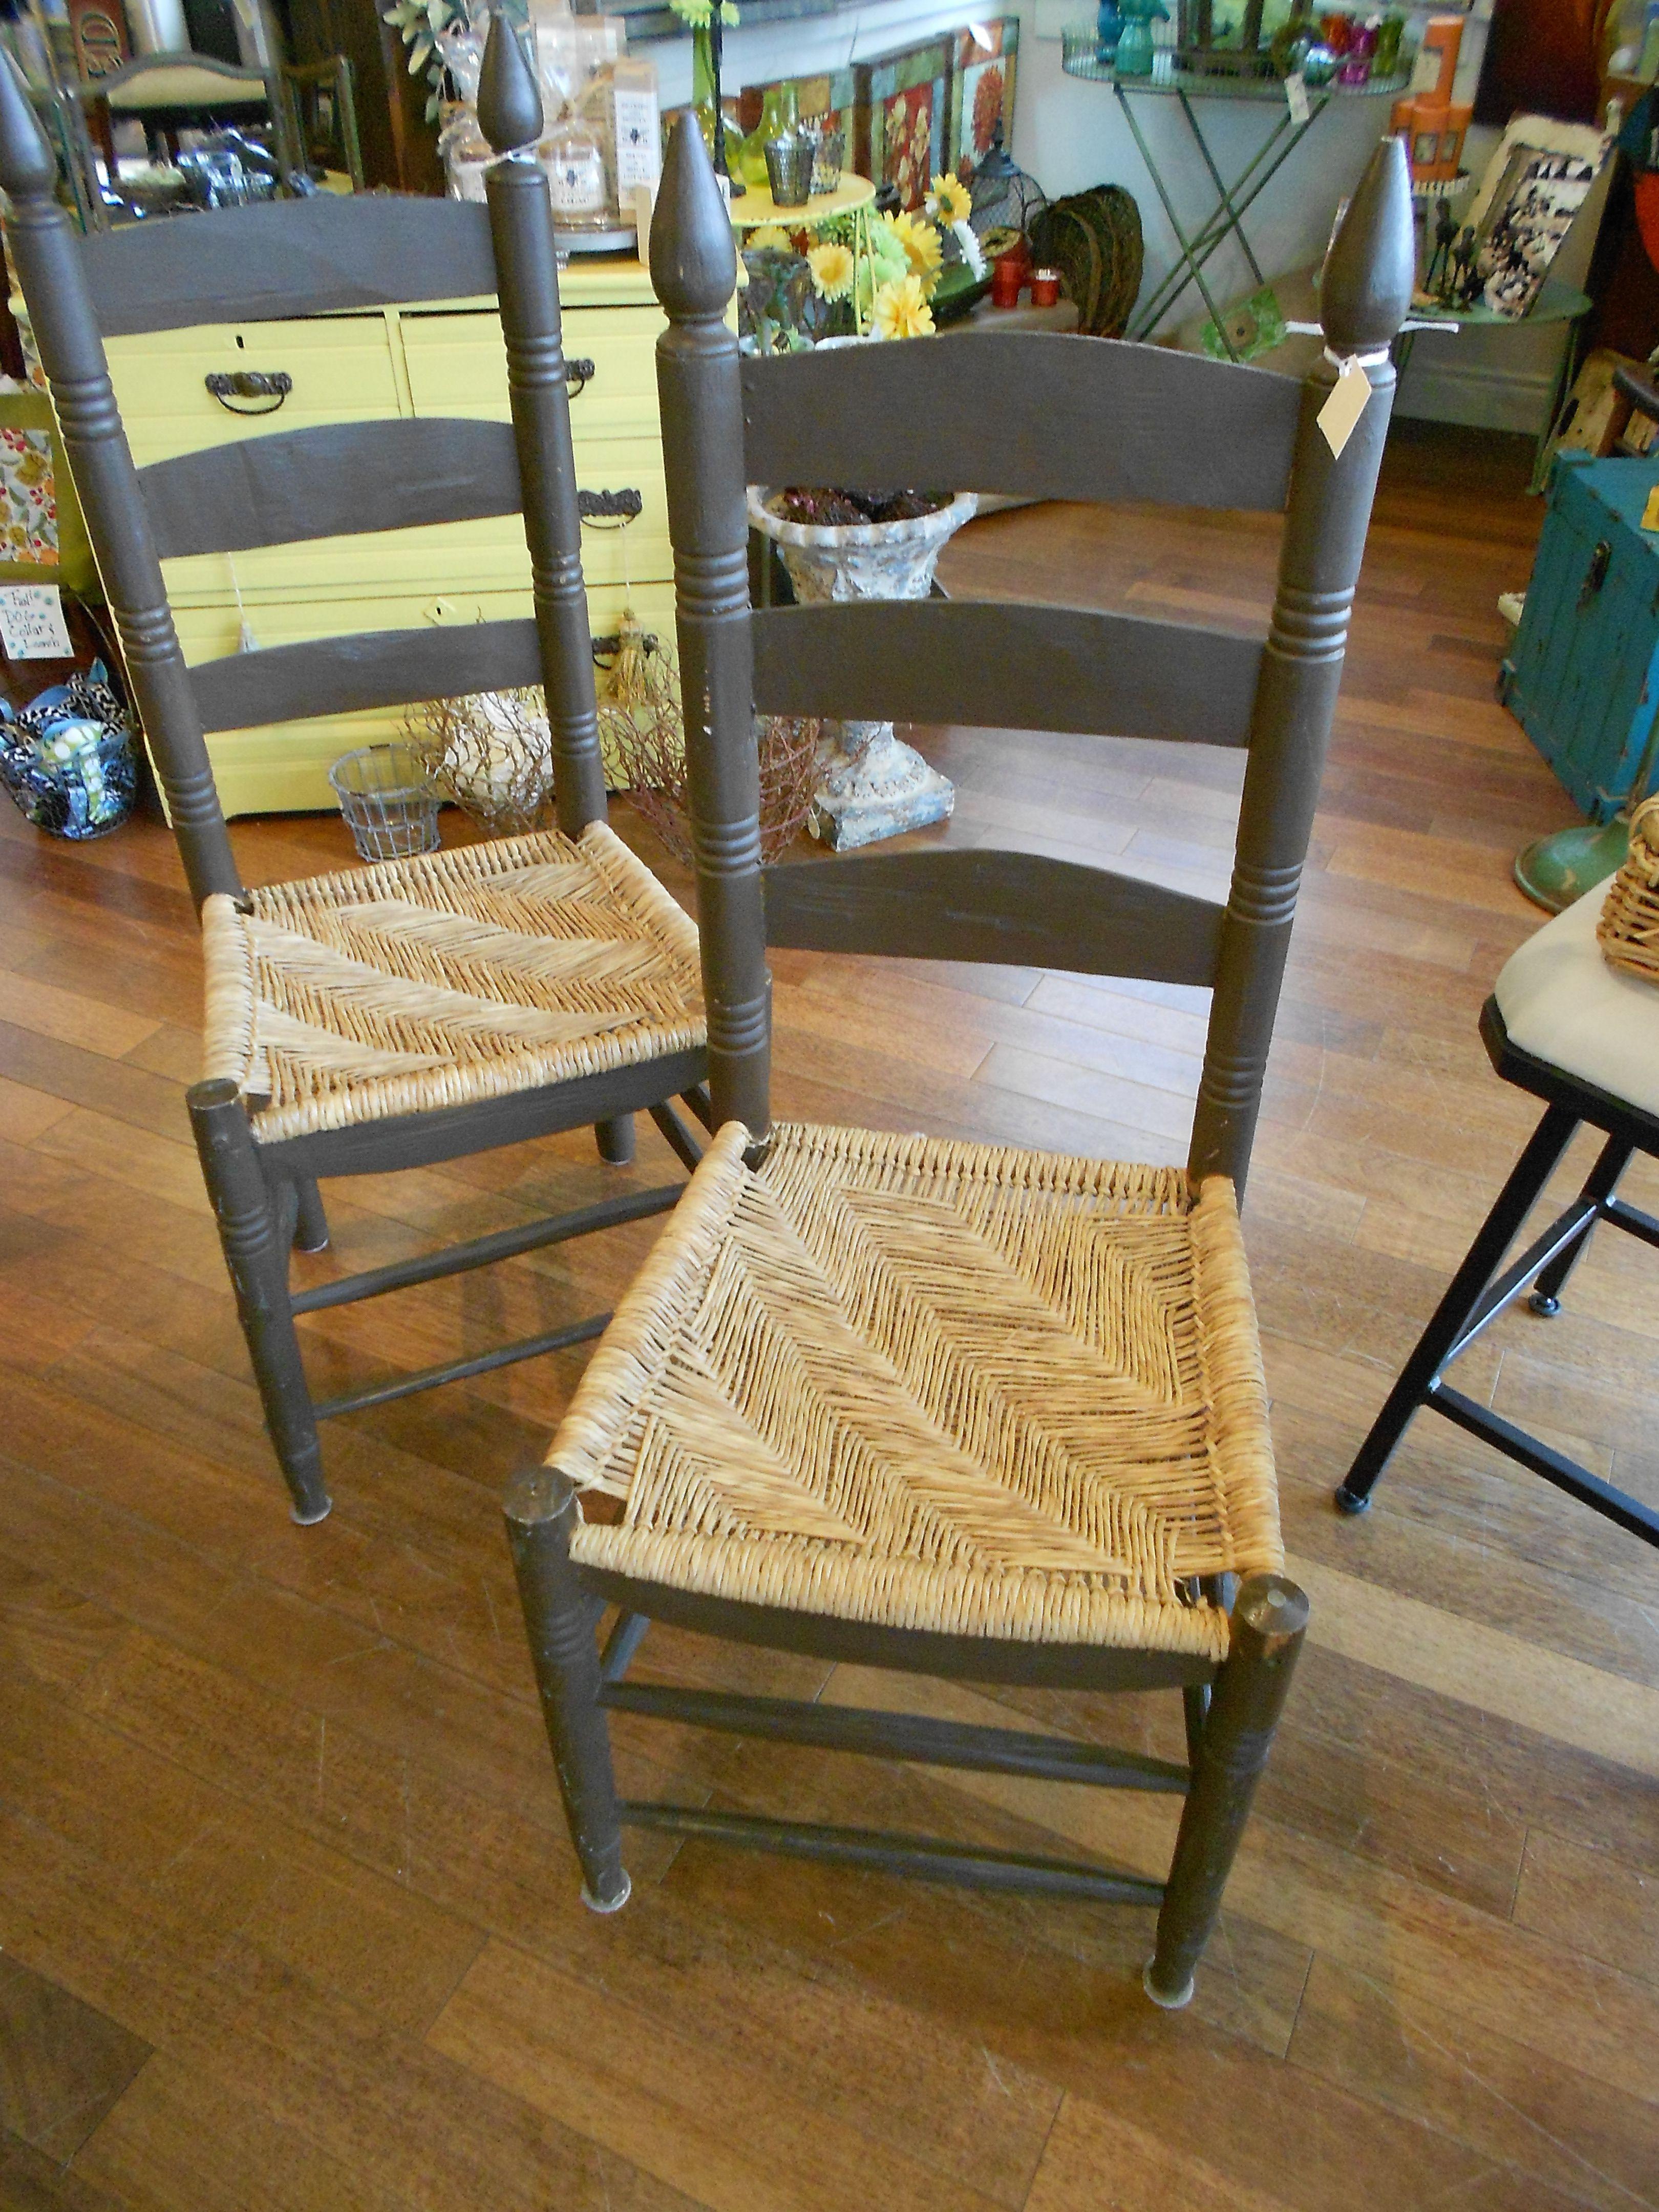 Fun Woven Seat Chairs. Chair Weaving Diy